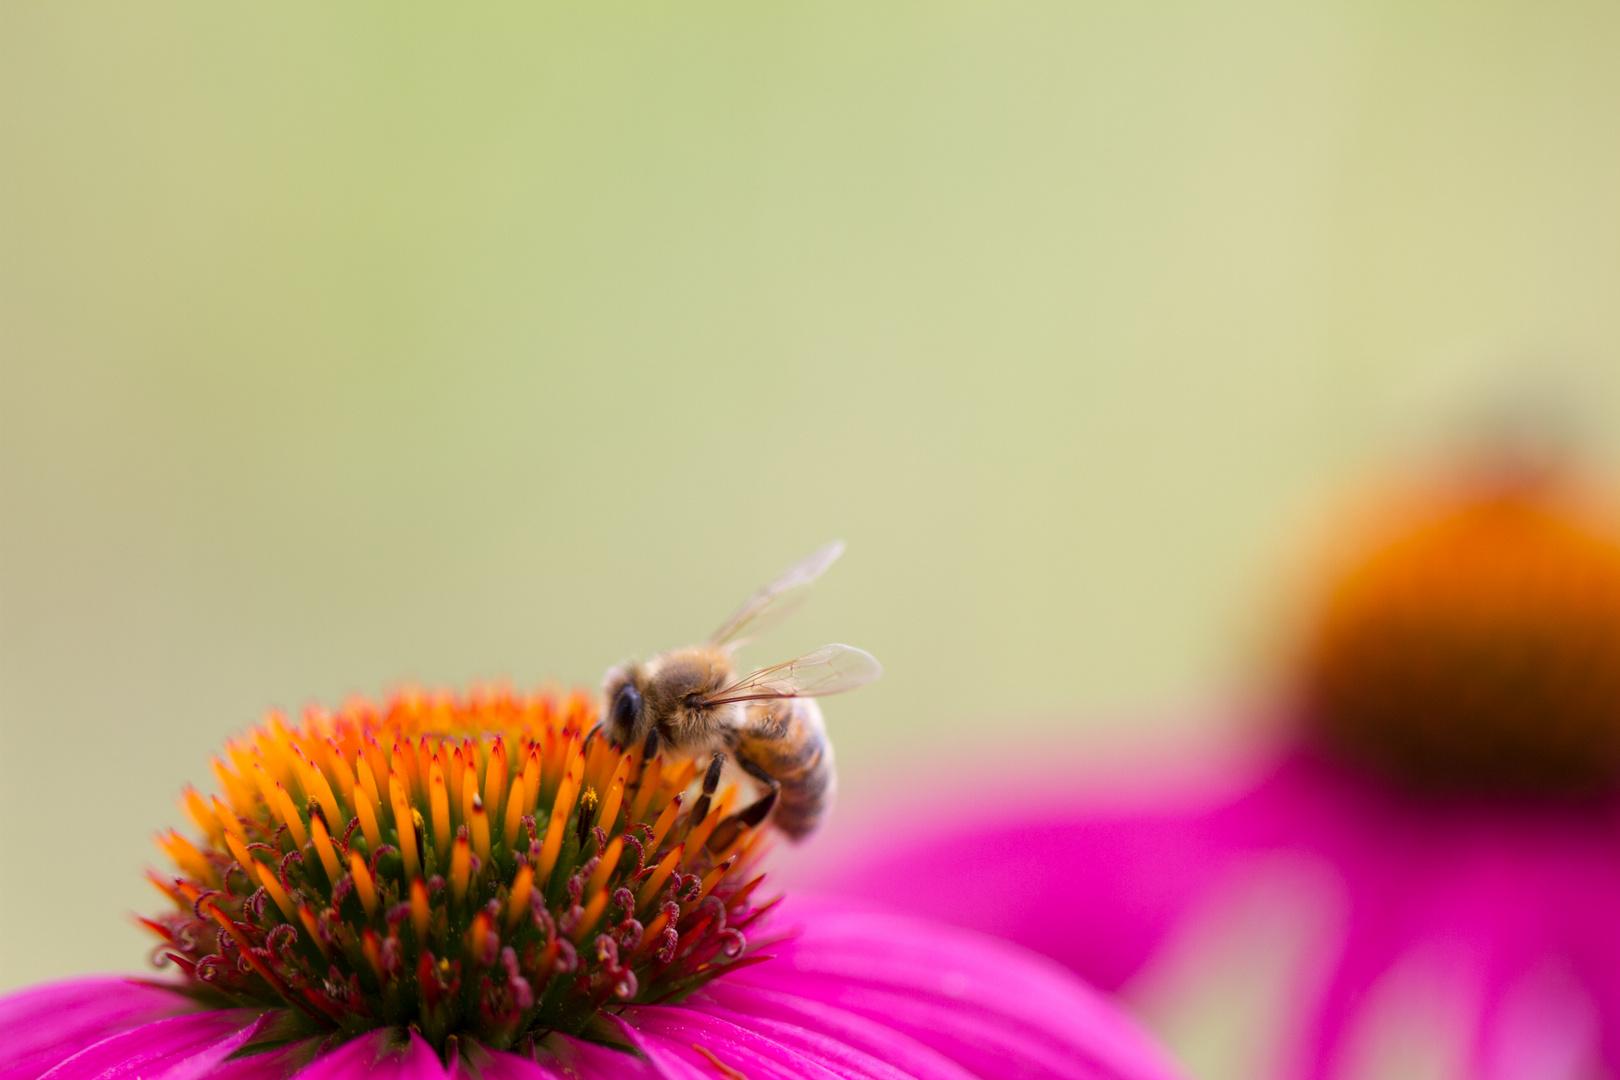 Closeup of a Honeybee on a Purple Coneflower - Honigbiene auf Sonnenhut